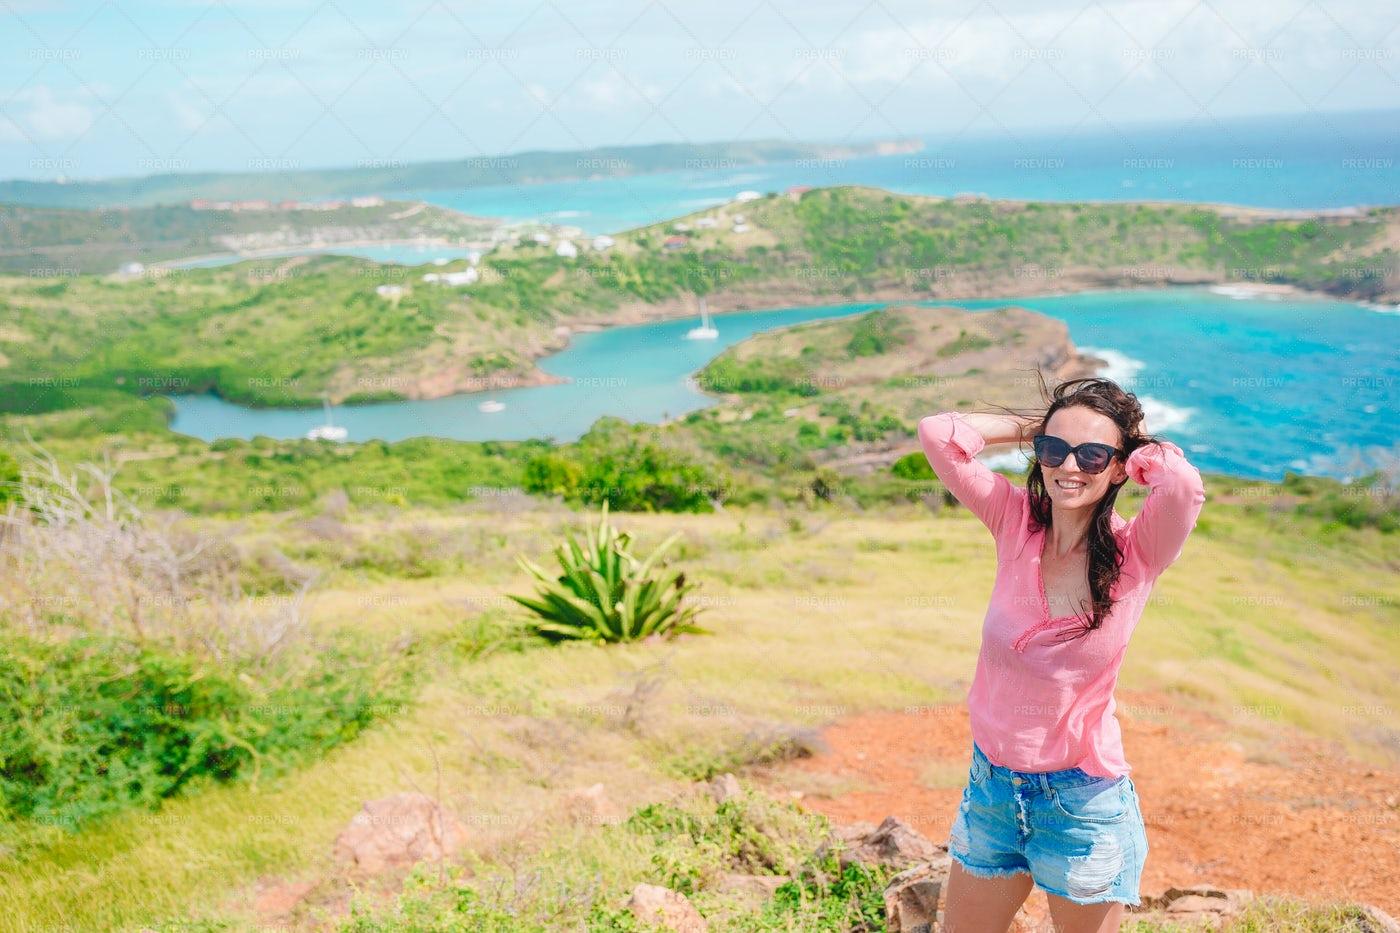 Woman On Caribbean Landscape: Stock Photos